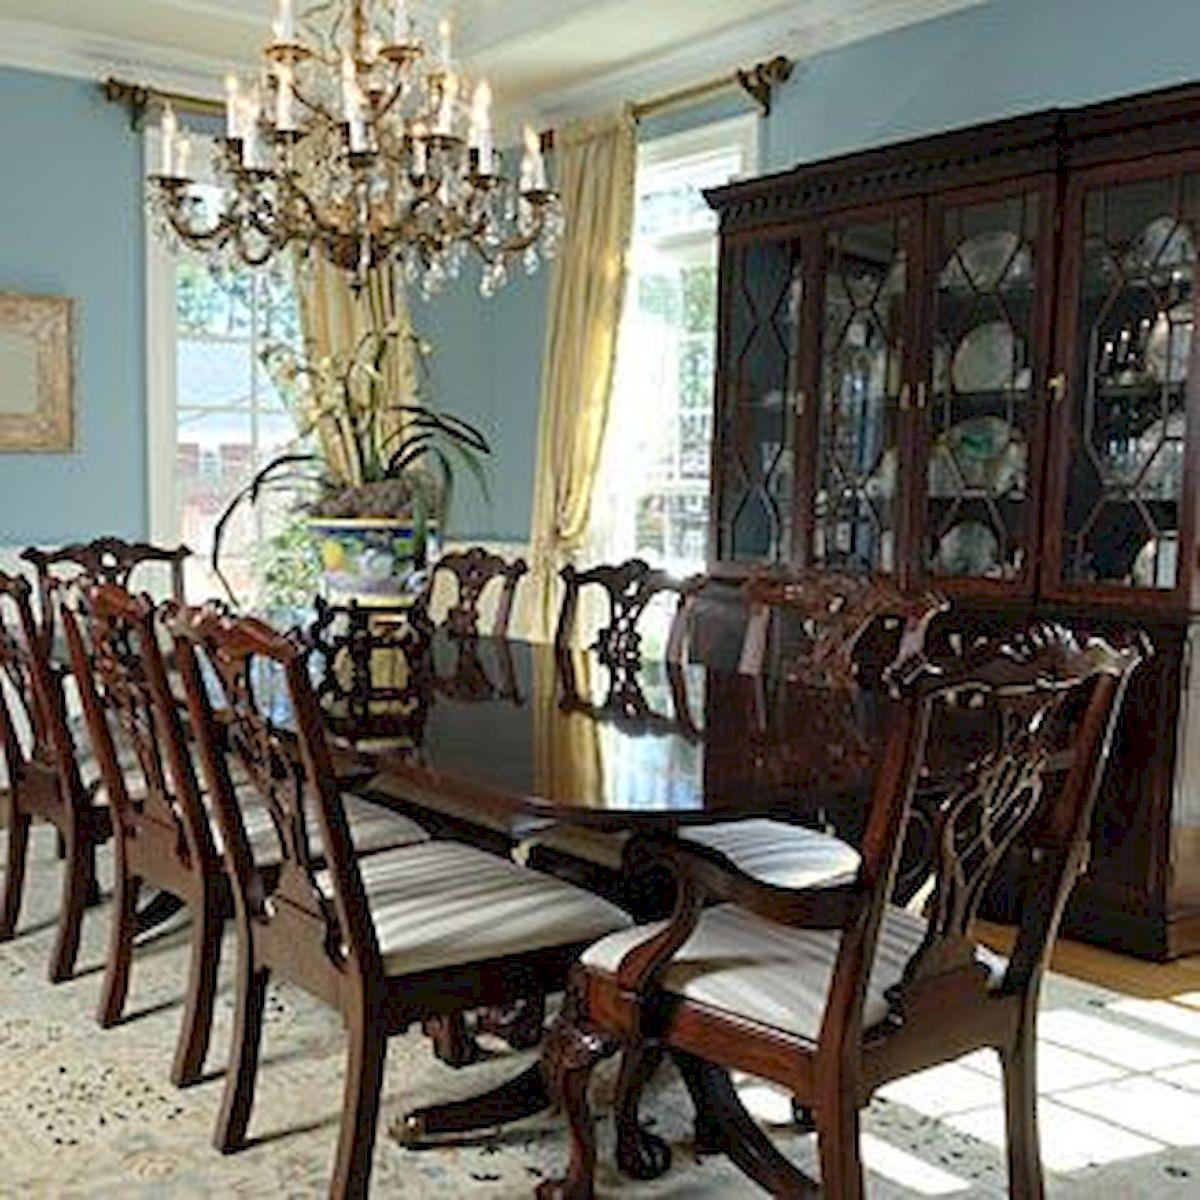 23 Elegant Traditional Dining Room Design Ideas: 160+ Awesome Formal Design Ideas For Your Dining Room